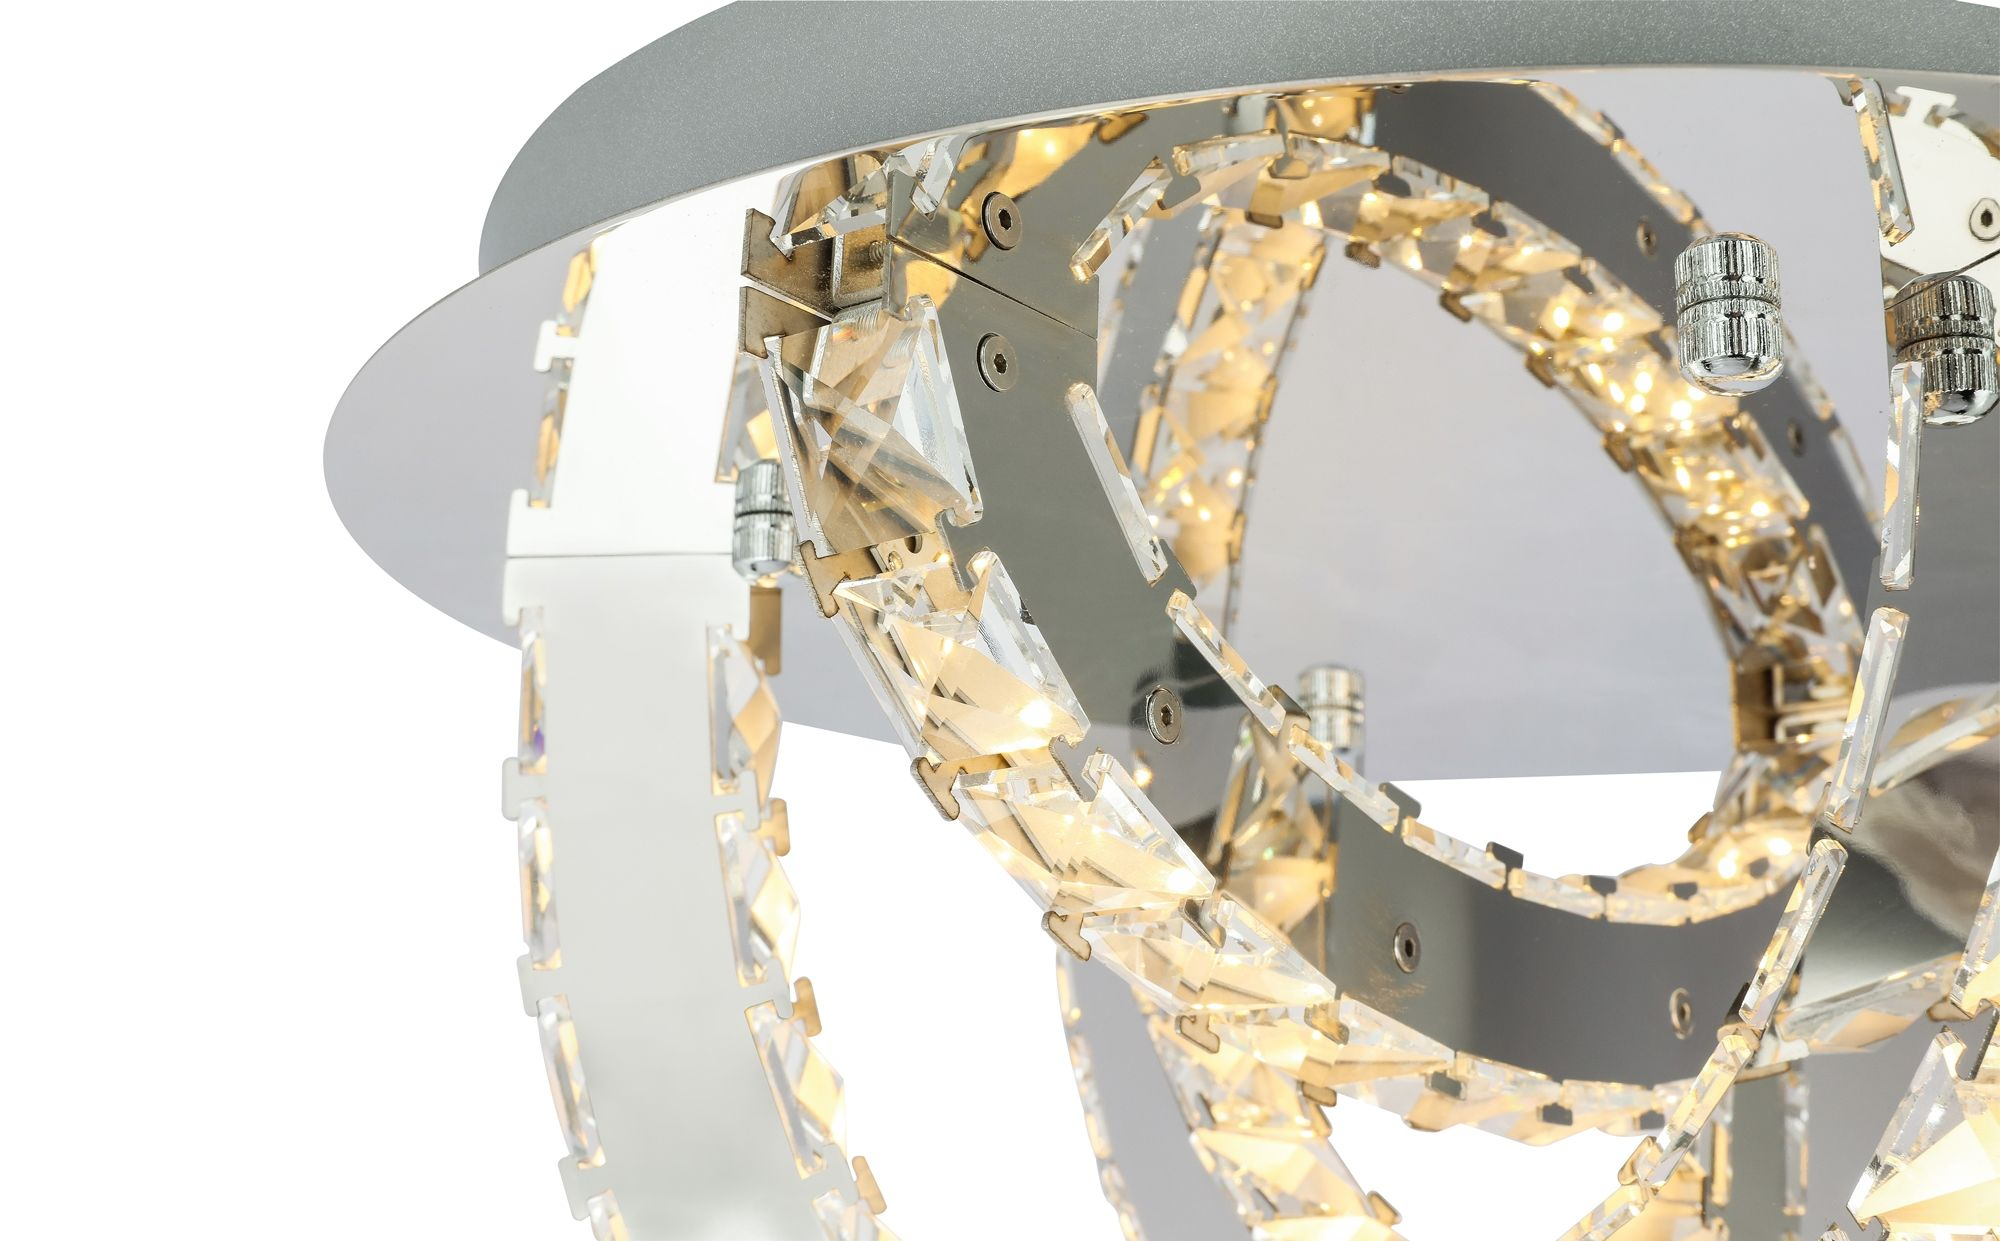 Plafoniera Led Dimabila : Lustra plafoniera led dimabila design elegant juna w